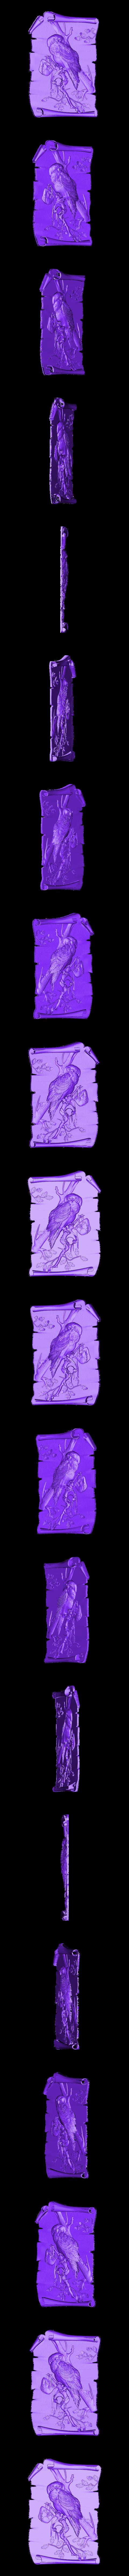 908. Panno.stl Download free STL file Owl • 3D printer design, stl3dmodel